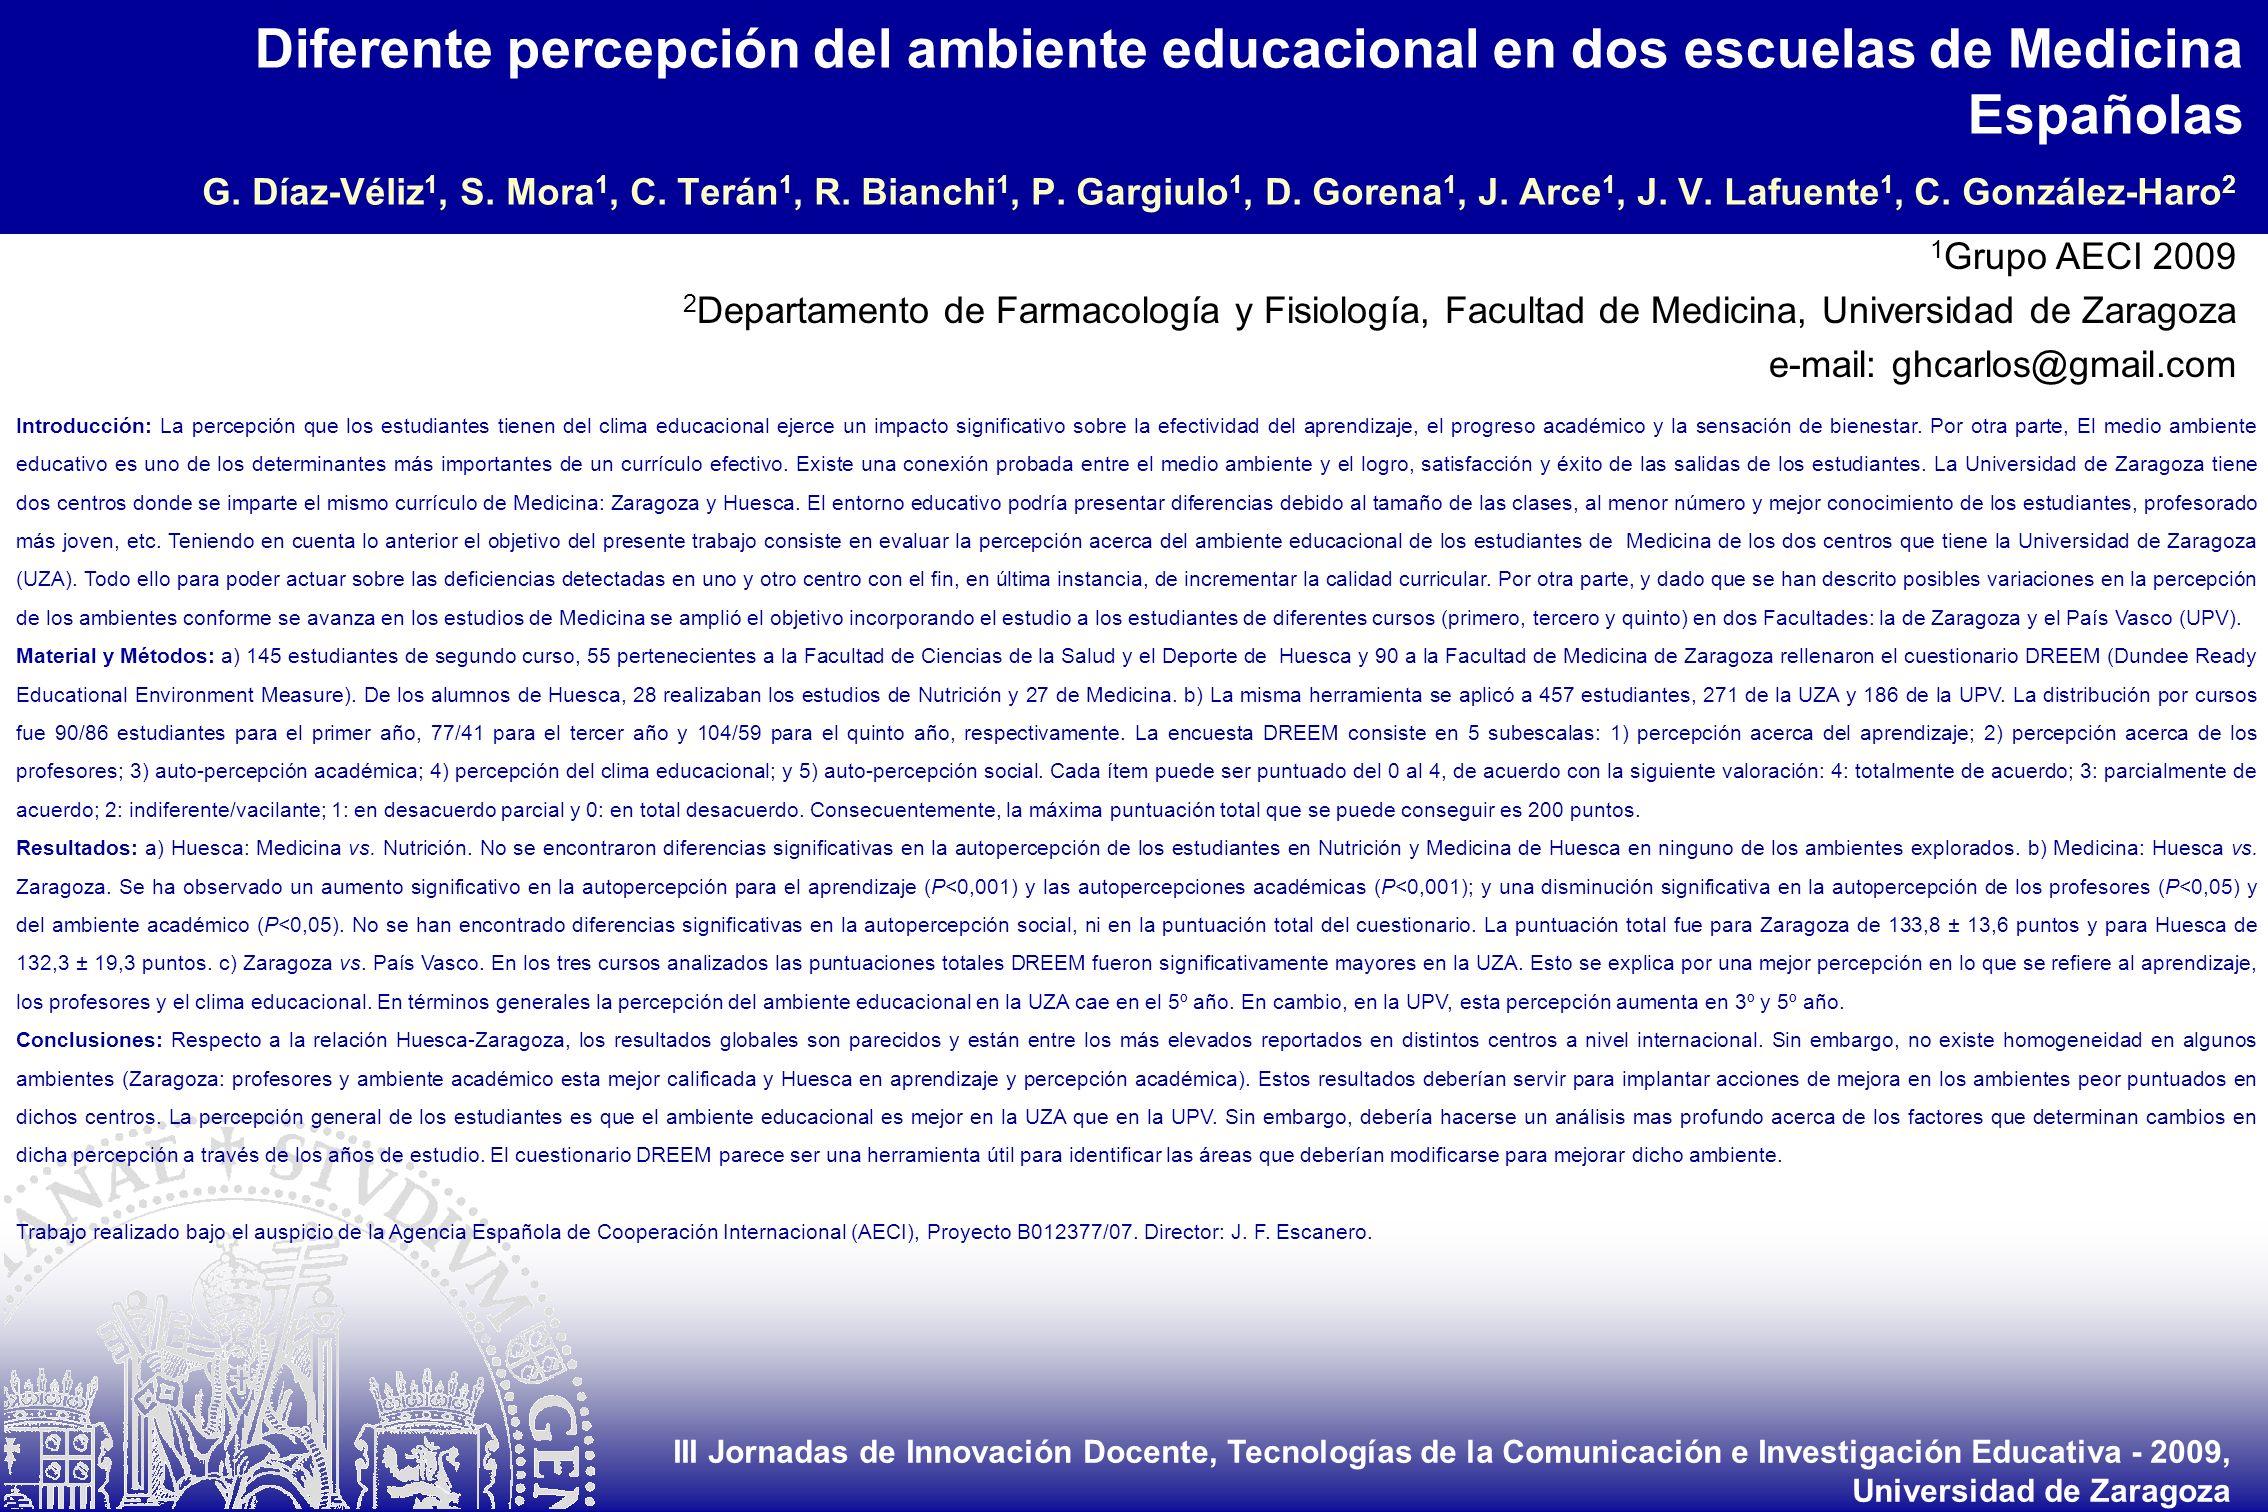 III Jornadas de Innovación Docente, Tecnologías de la Comunicación e Investigación Educativa - 2009, Universidad de Zaragoza 1 Grupo AECI 2009 2 Depar